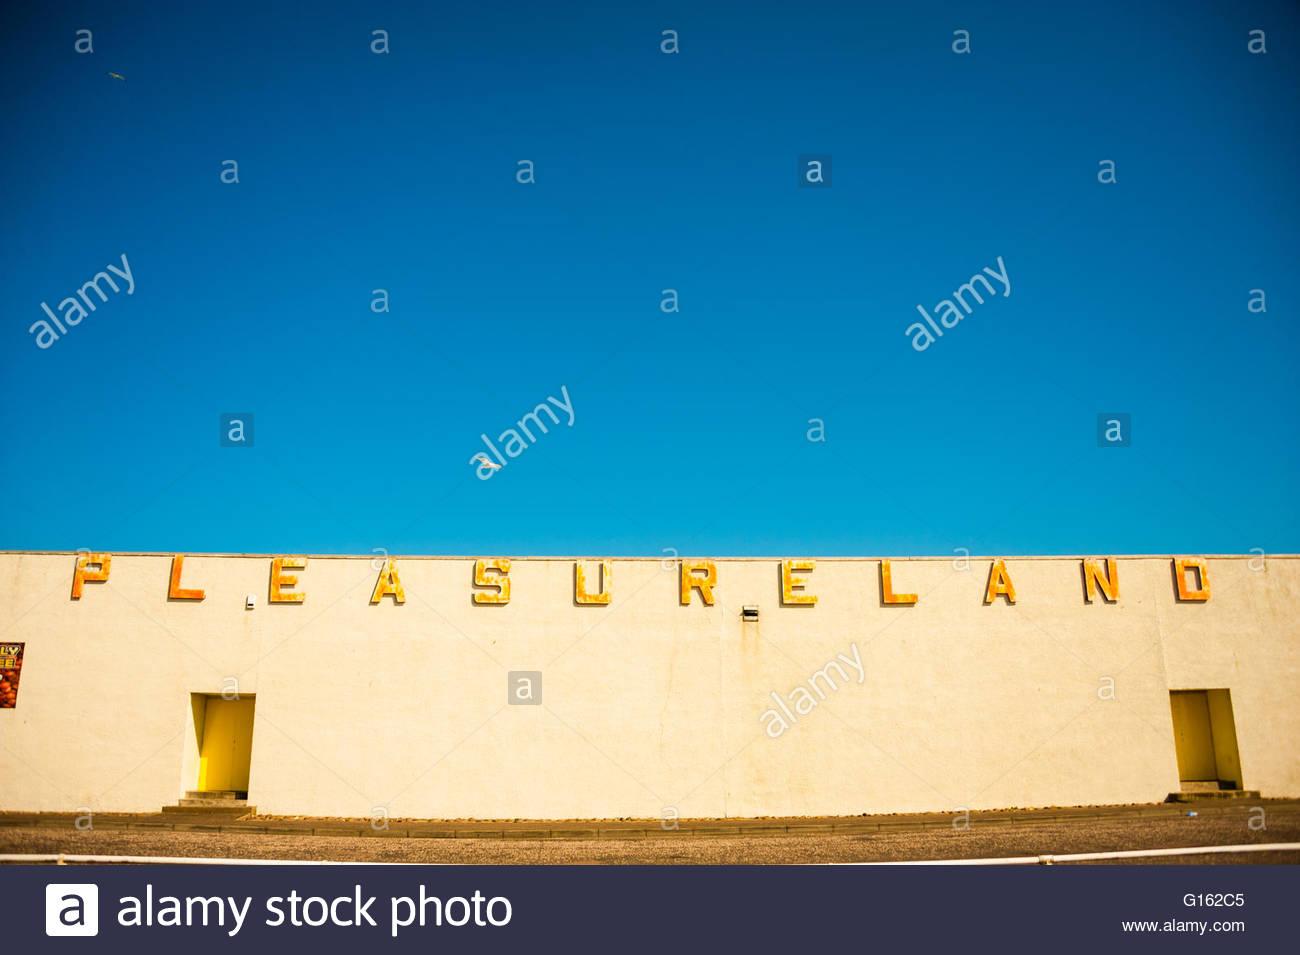 Arbroath, Scotland, UK. 9th May 2016. UK Weather, Sunshine in Scotland, Pleasureland Arbroath, Scotland was expected Stock Photo